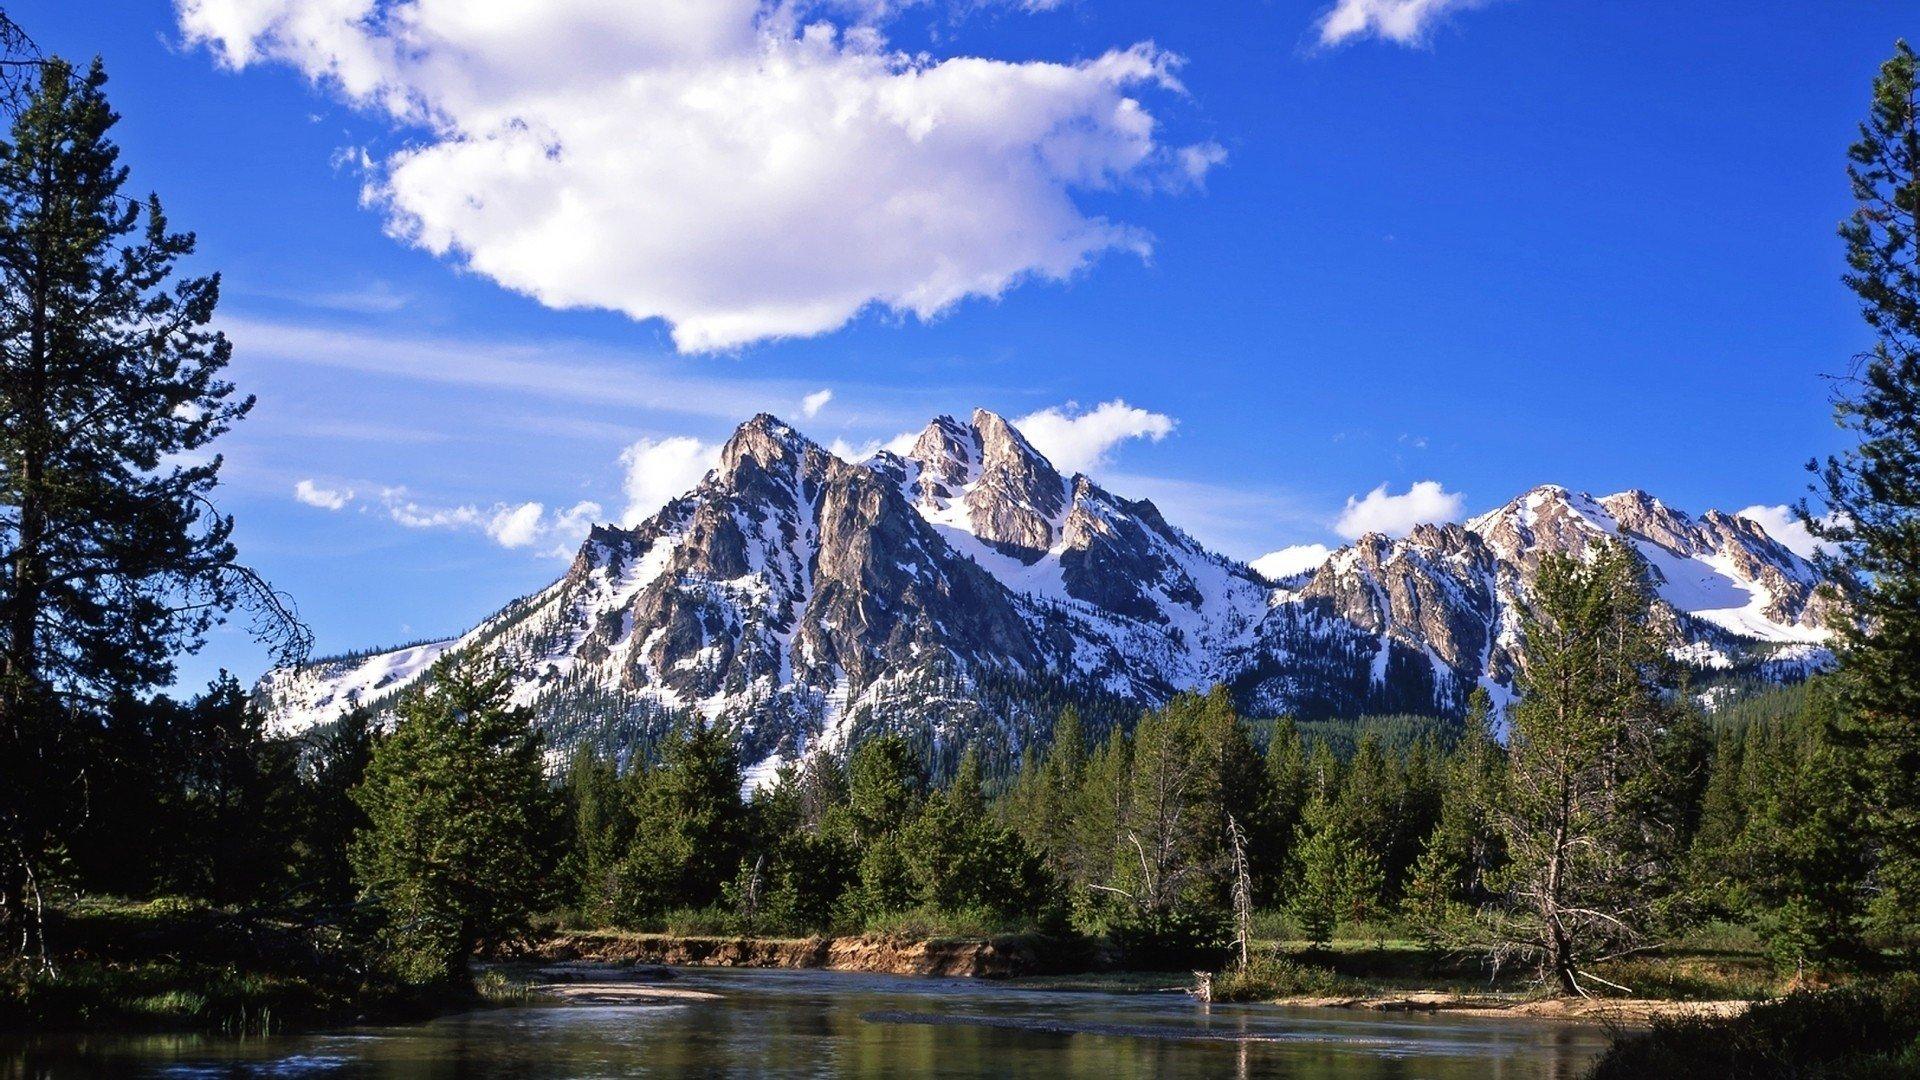 Majestic Fall Wallpaper Nature Mountain Forest Landscape Fog Lake Ultrahd 4k